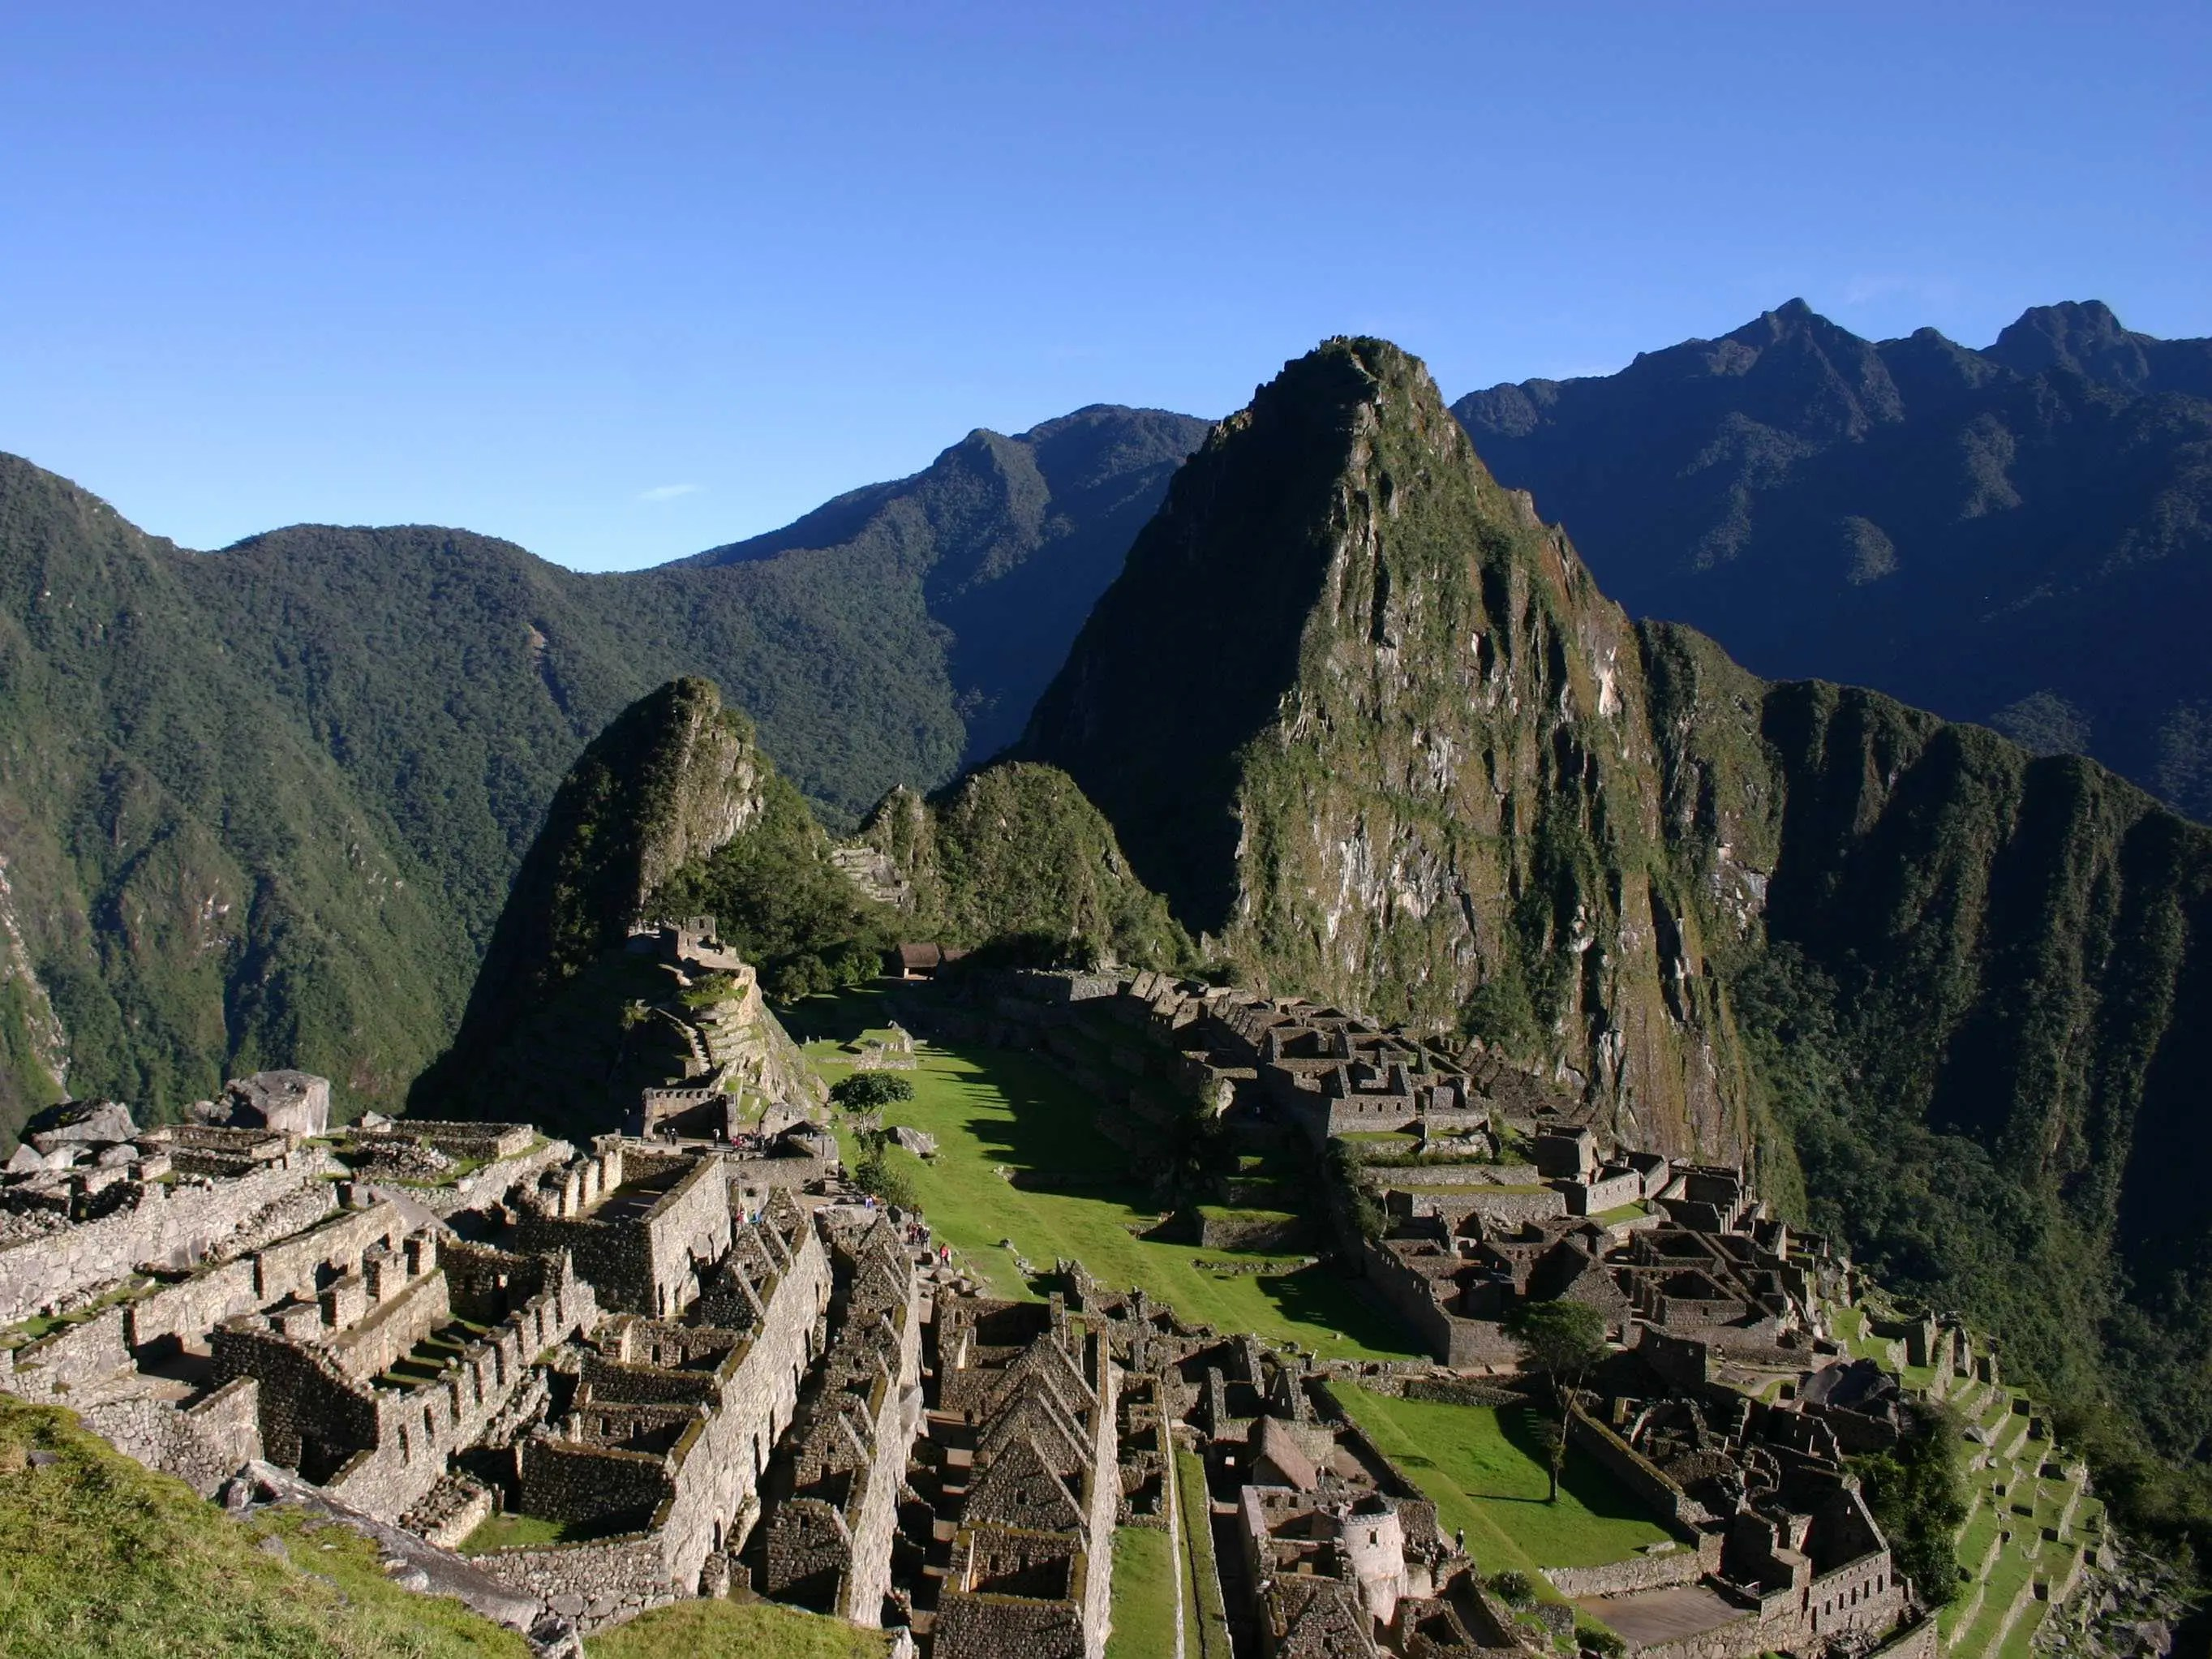 Climb to the top of Huayna Picchu for a bird's-eye view of Machu Picchu.